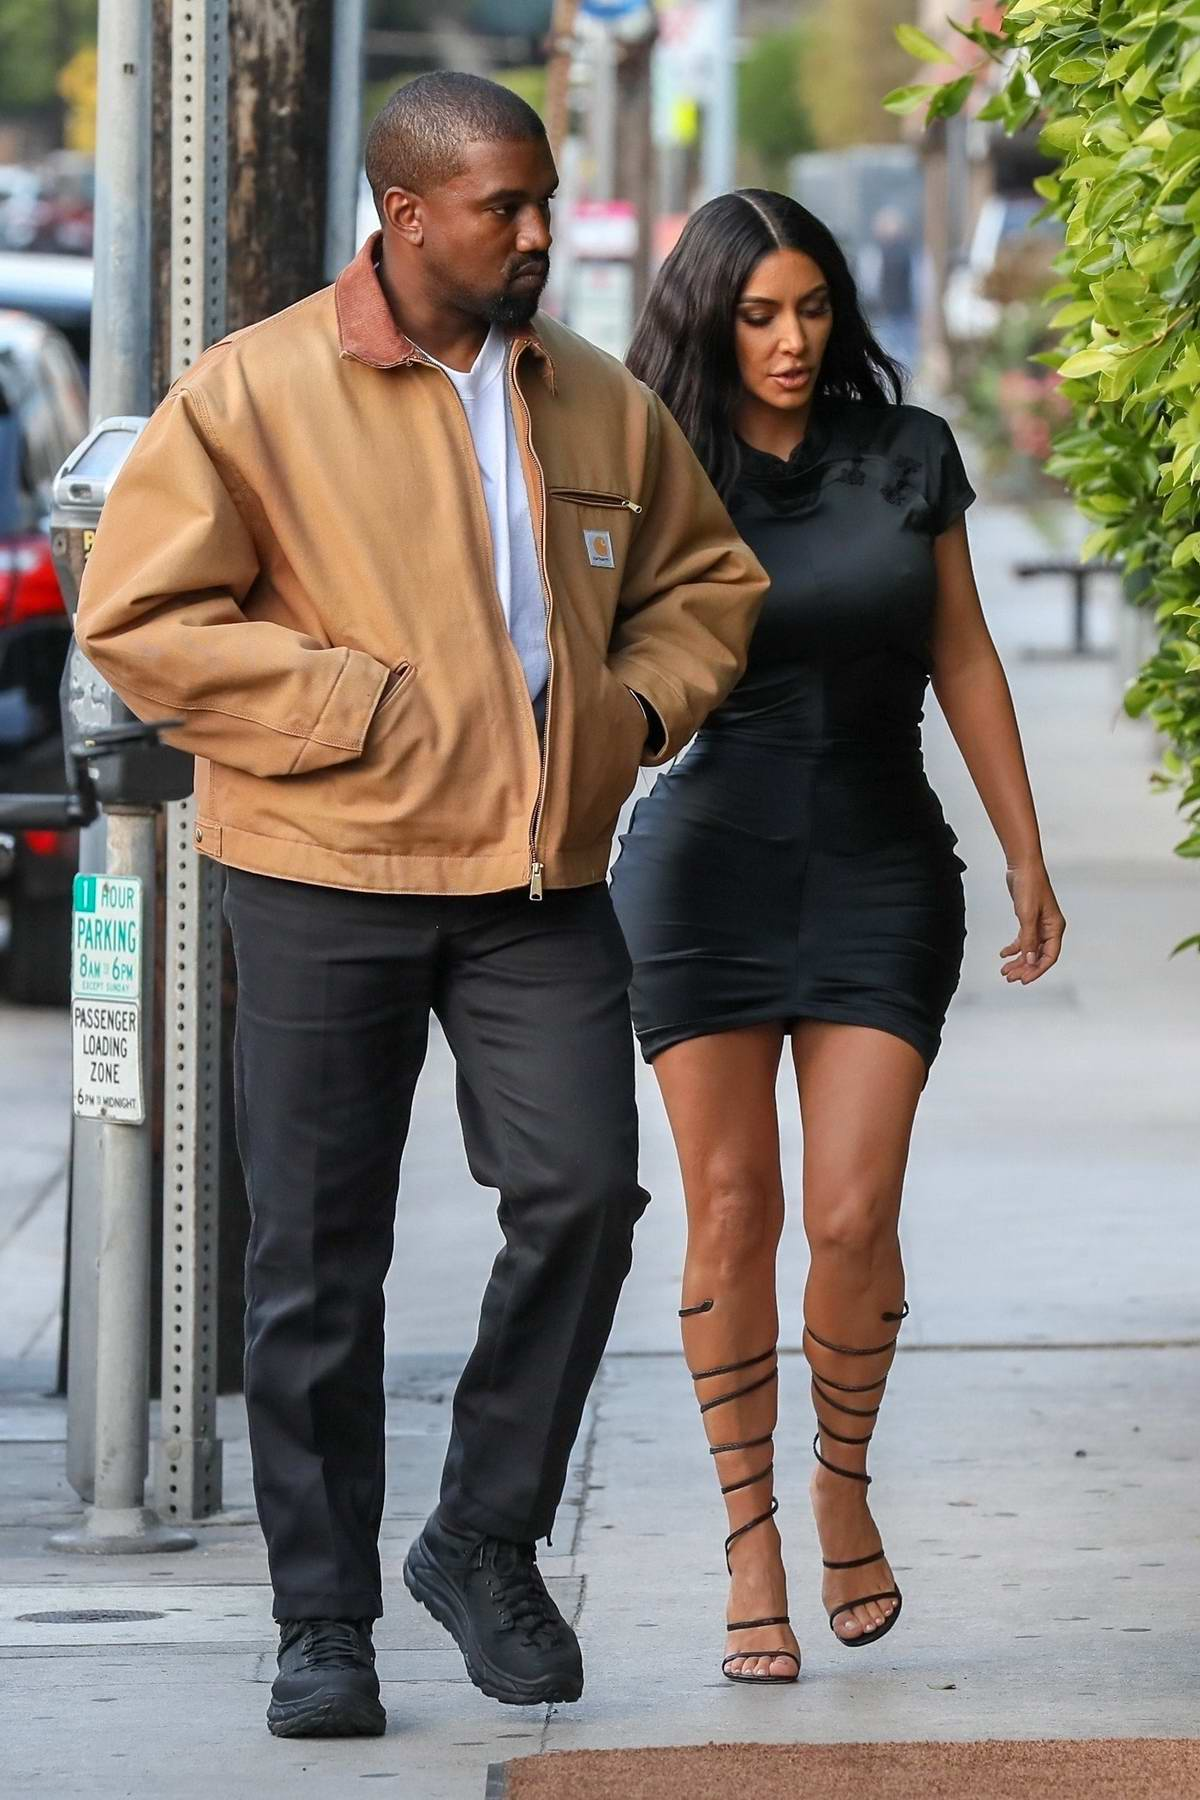 Kim Kardashian rocks form-fitting short black dress while out on a date night with Kanye at Giorgio Baldi in Santa Monica, California